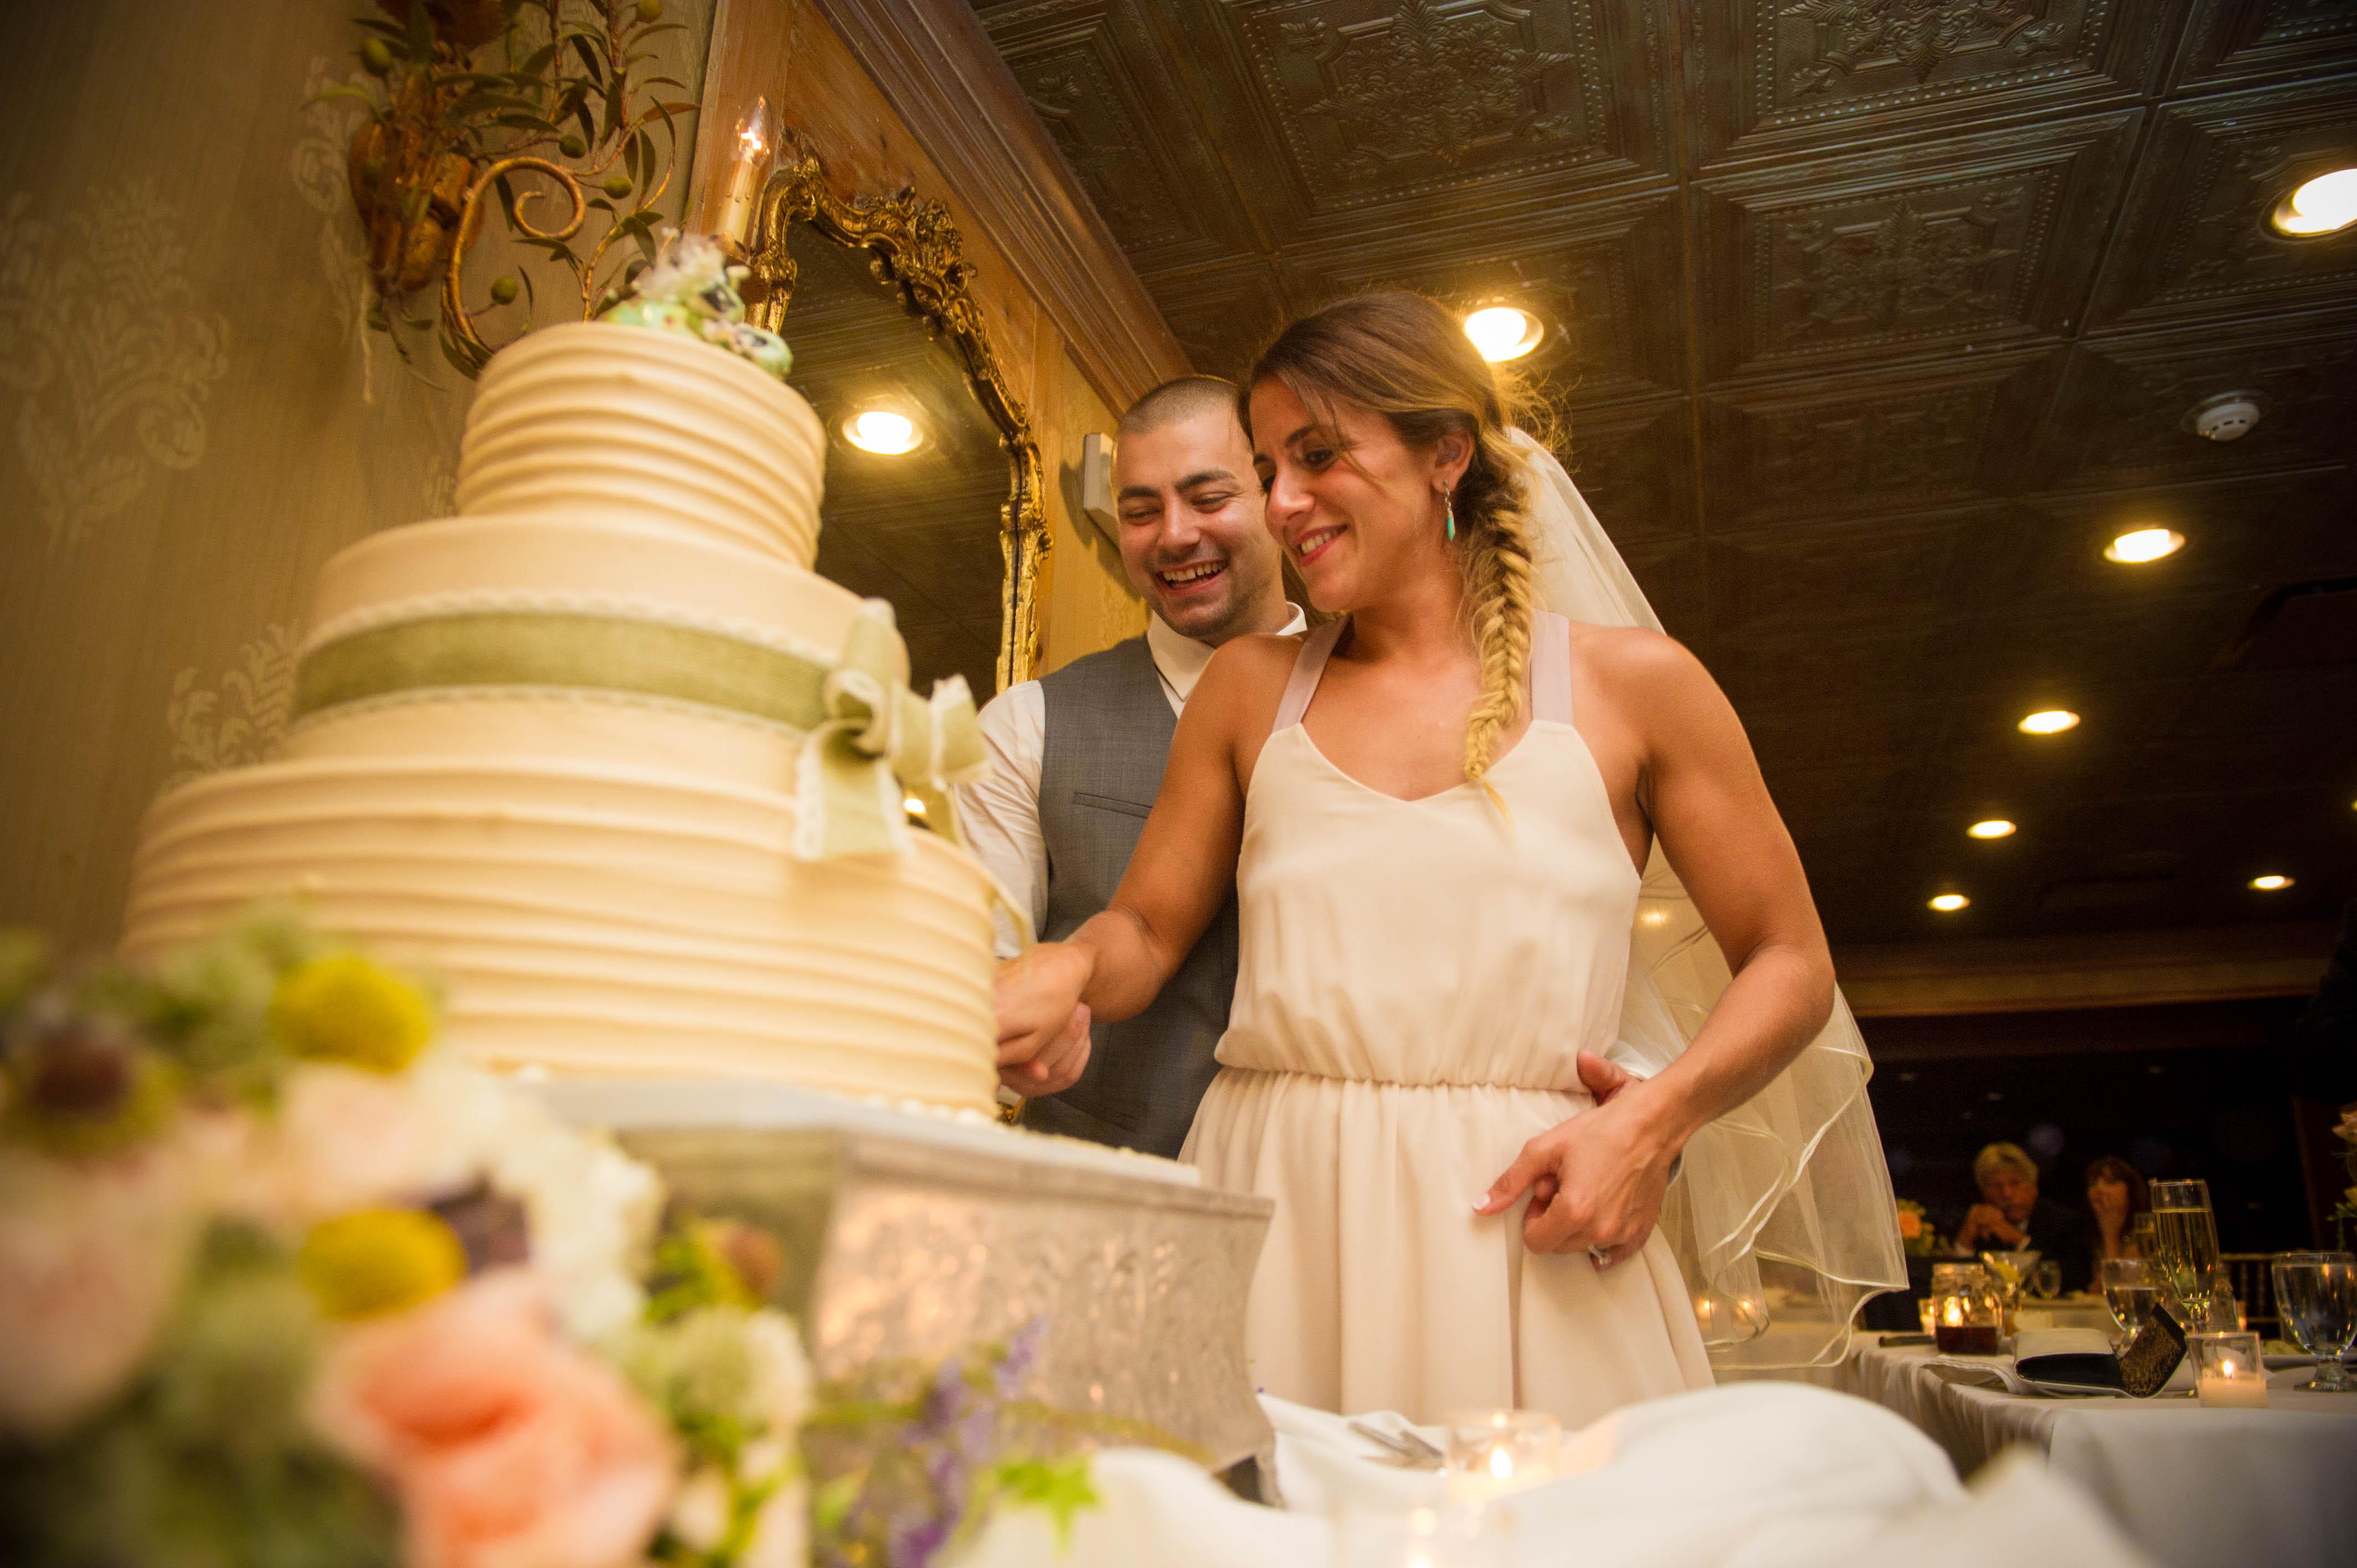 Dana and Michael Wedding at Olde Mill Inn - Enchanted Celebrations